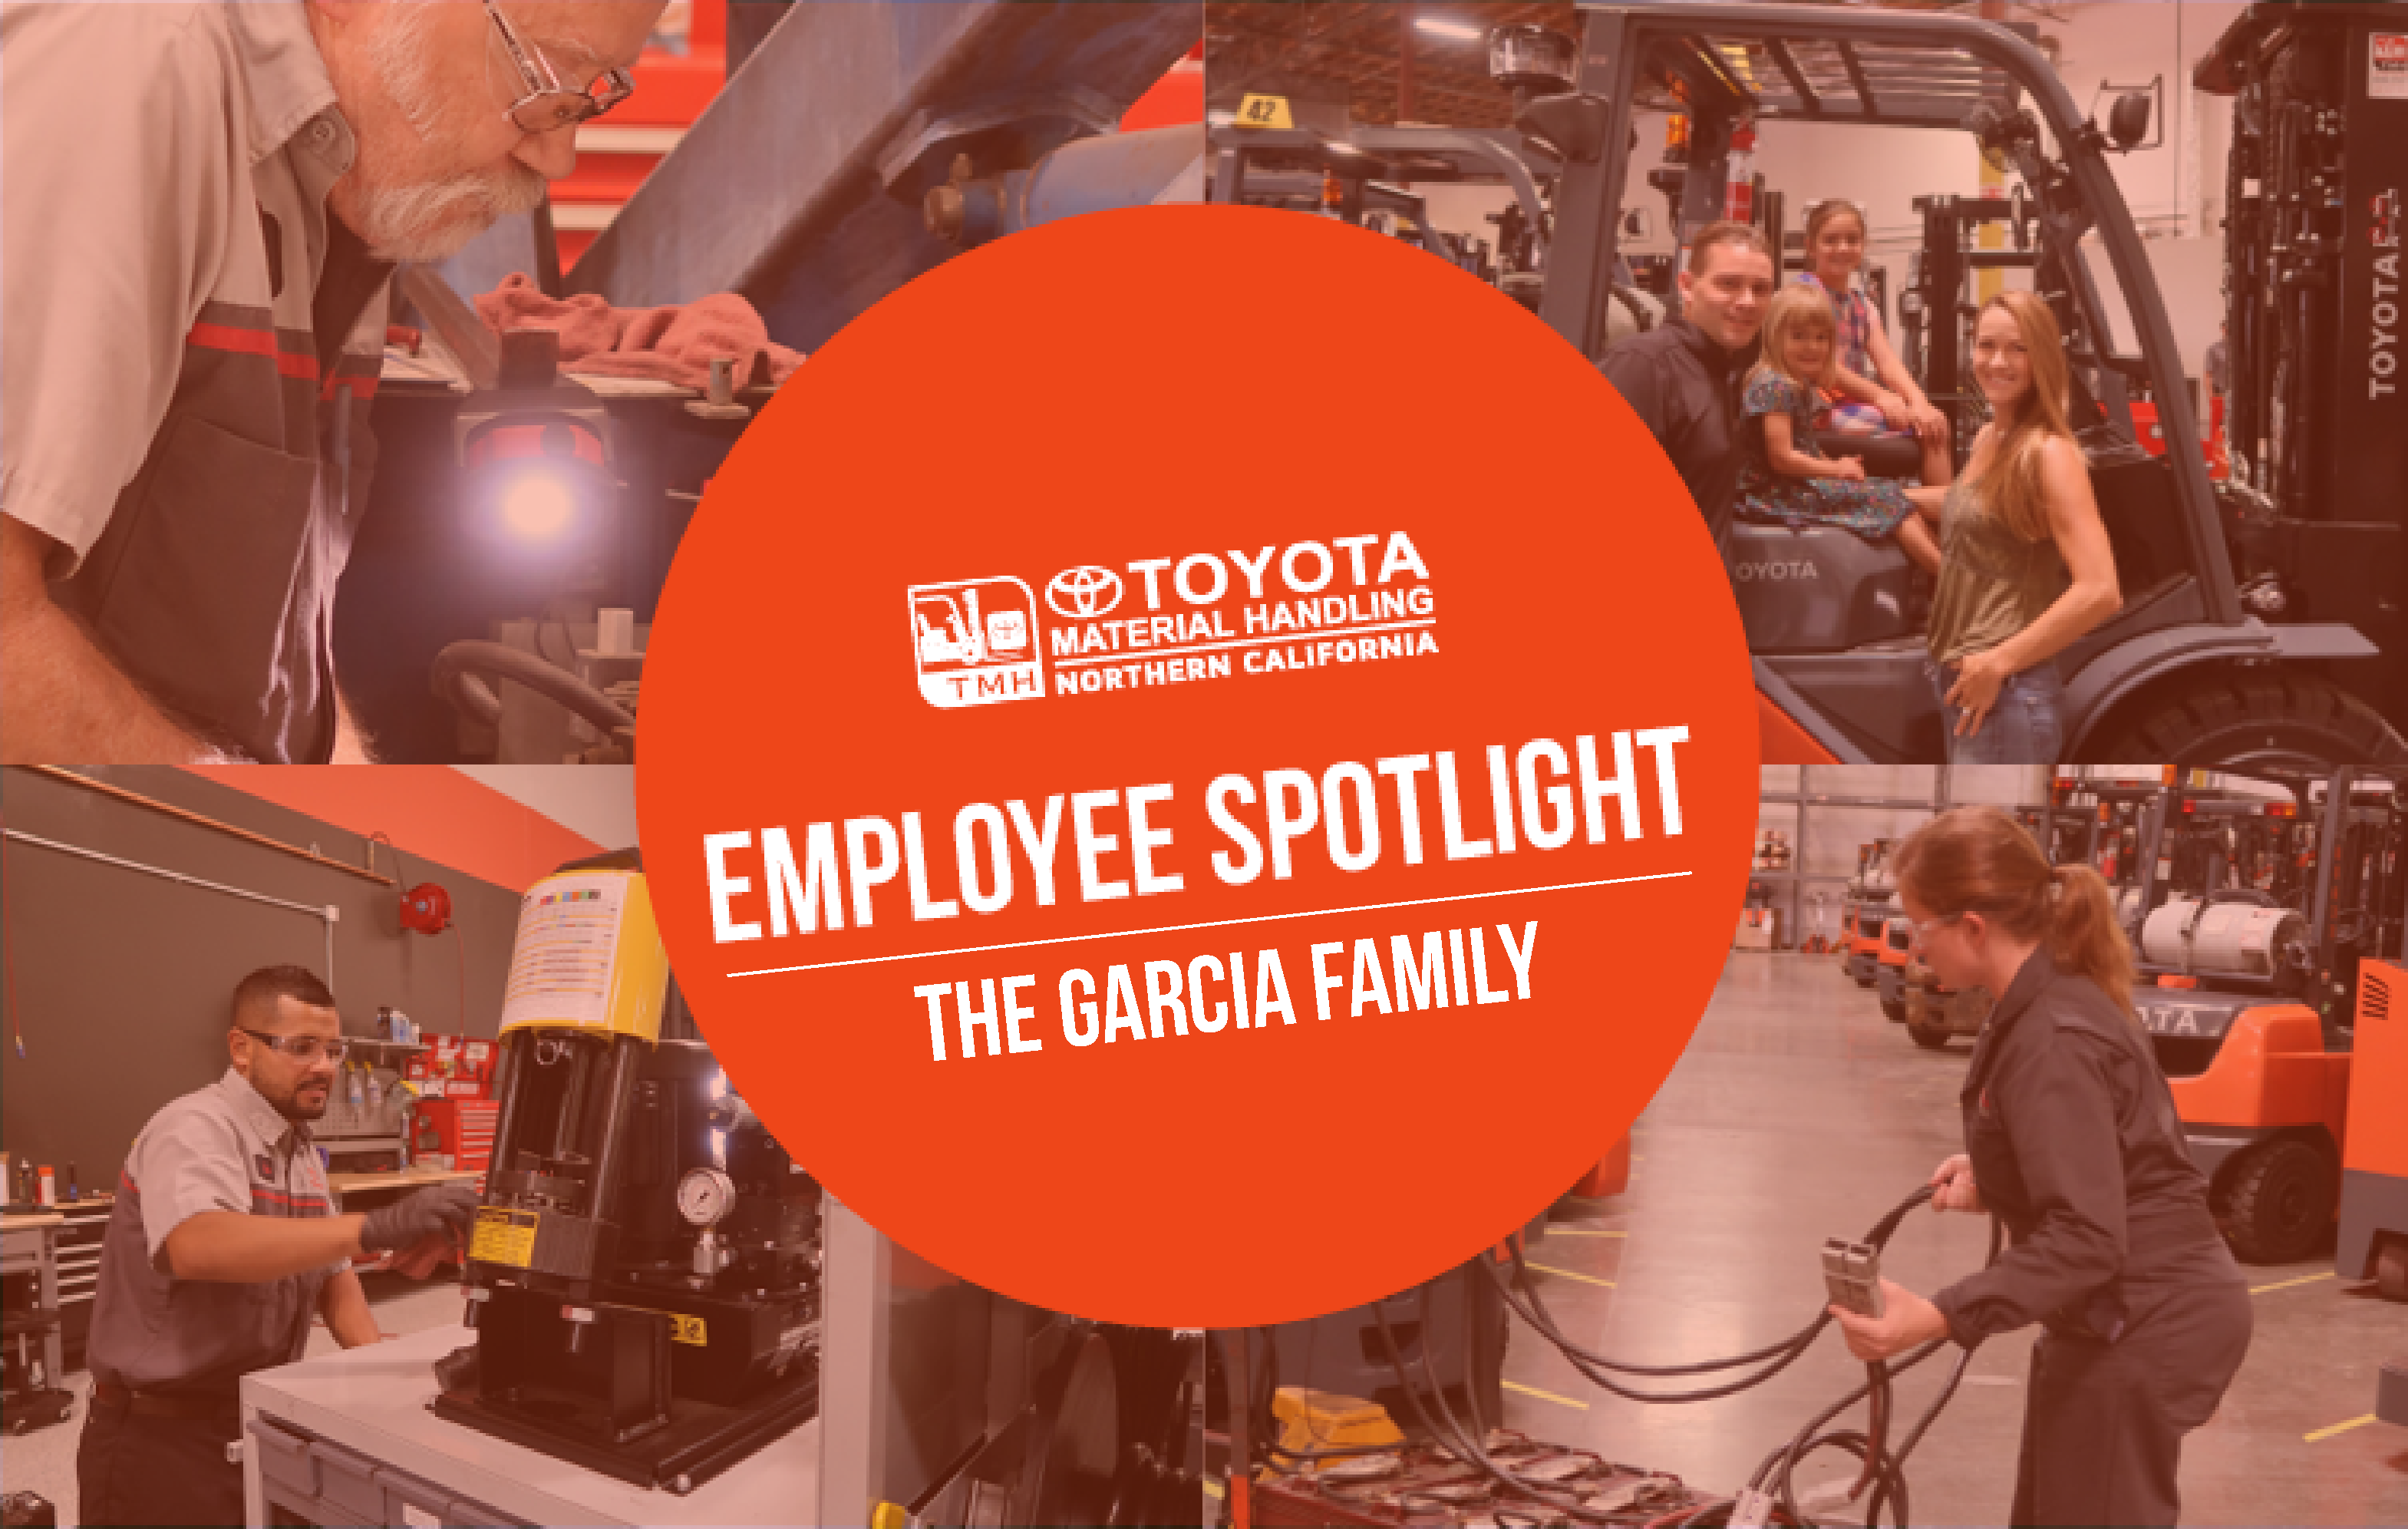 employee spotlight the garcia family